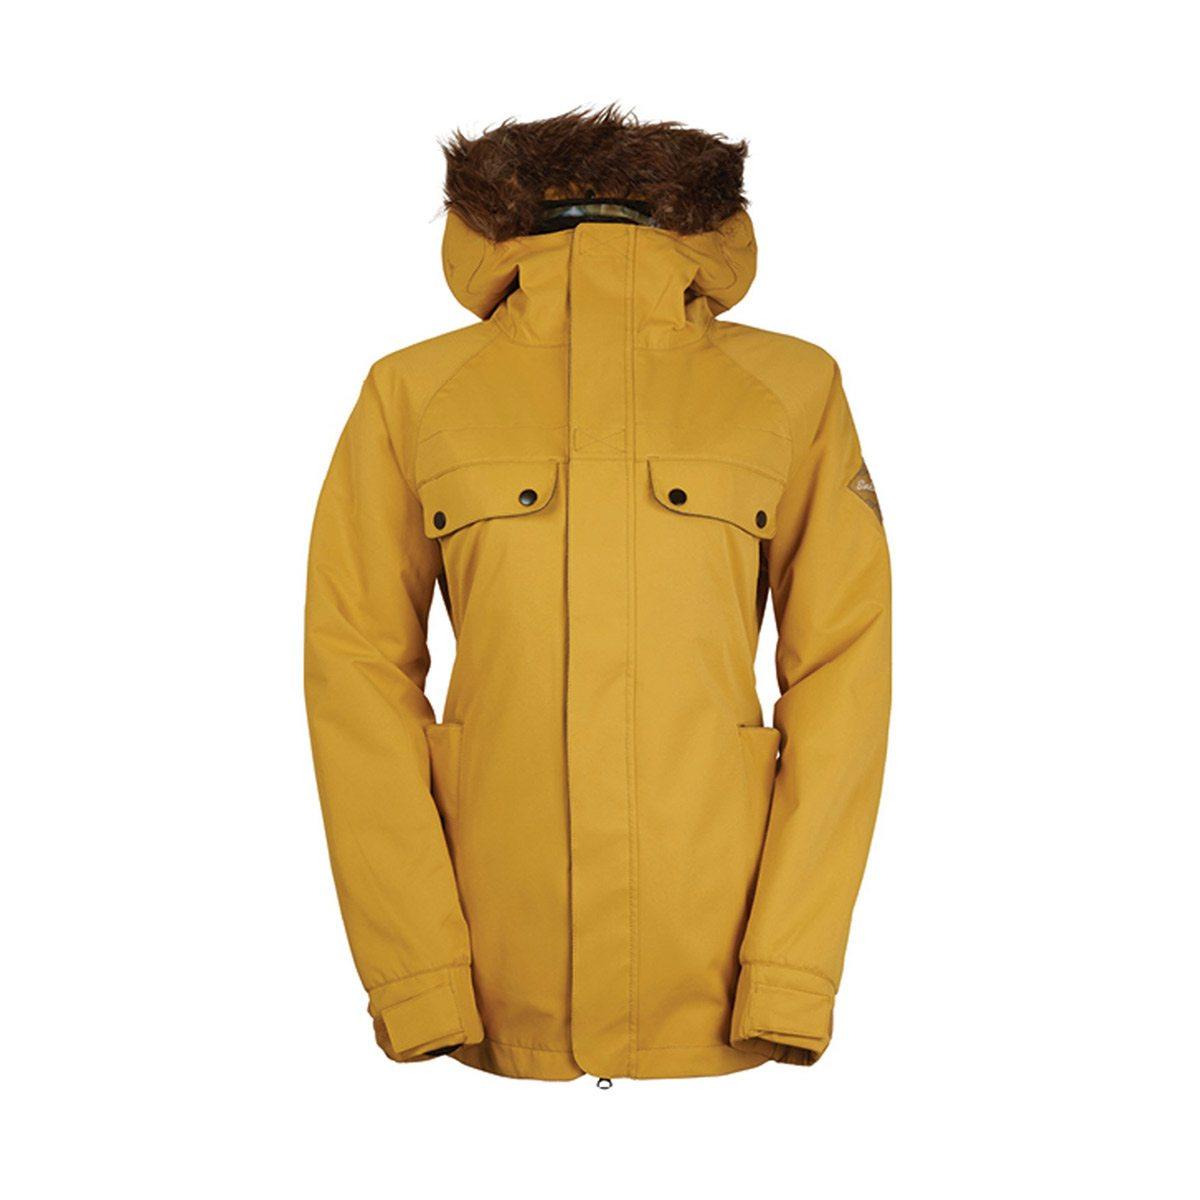 Куртки сноубордические 686 Bae Gold 2017